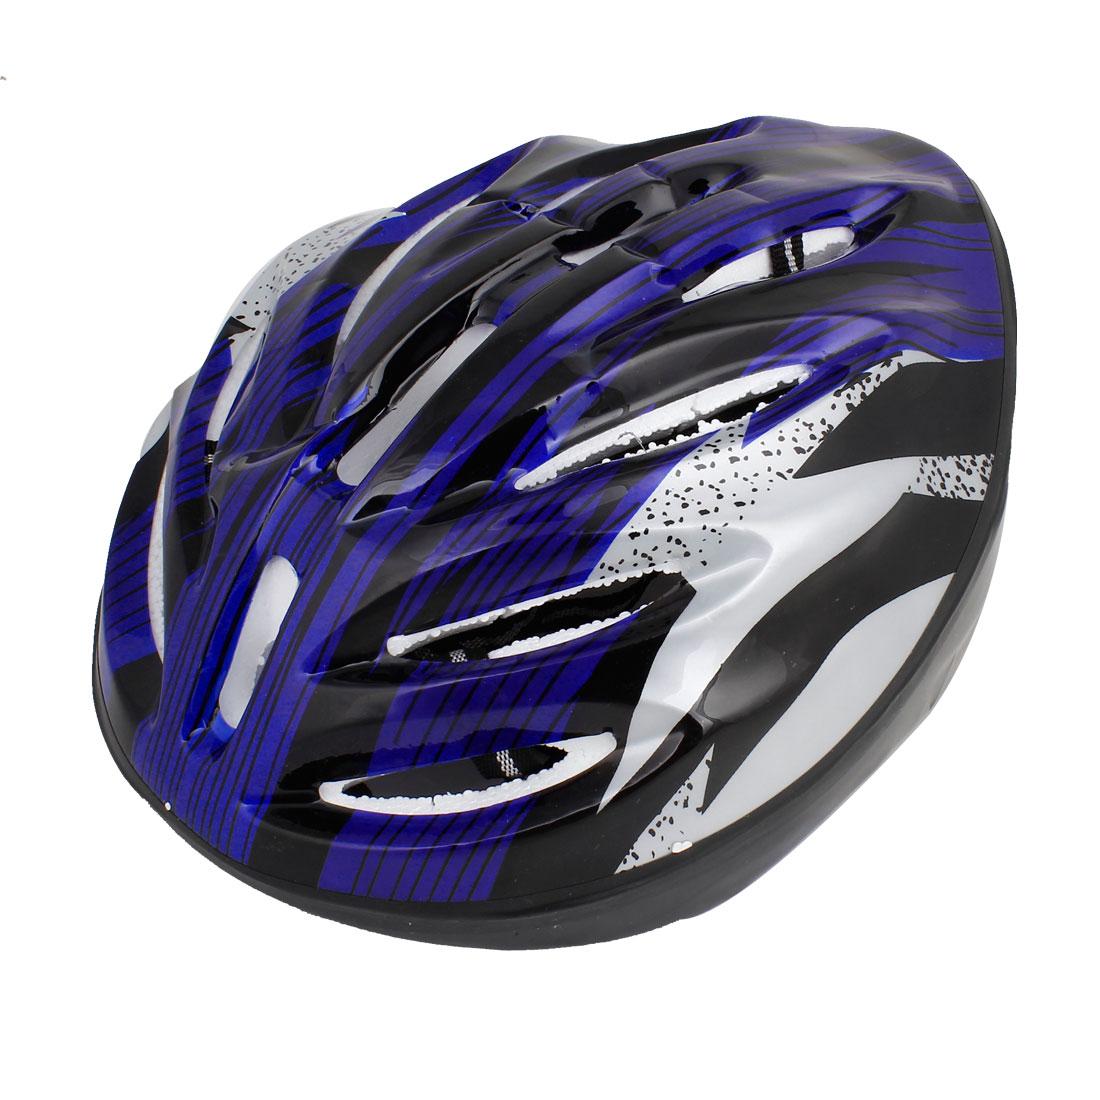 Unique Bargains Women Men Skateboard Skiing Racing Bicycle Bike Sports Helmet Blue Stripe by